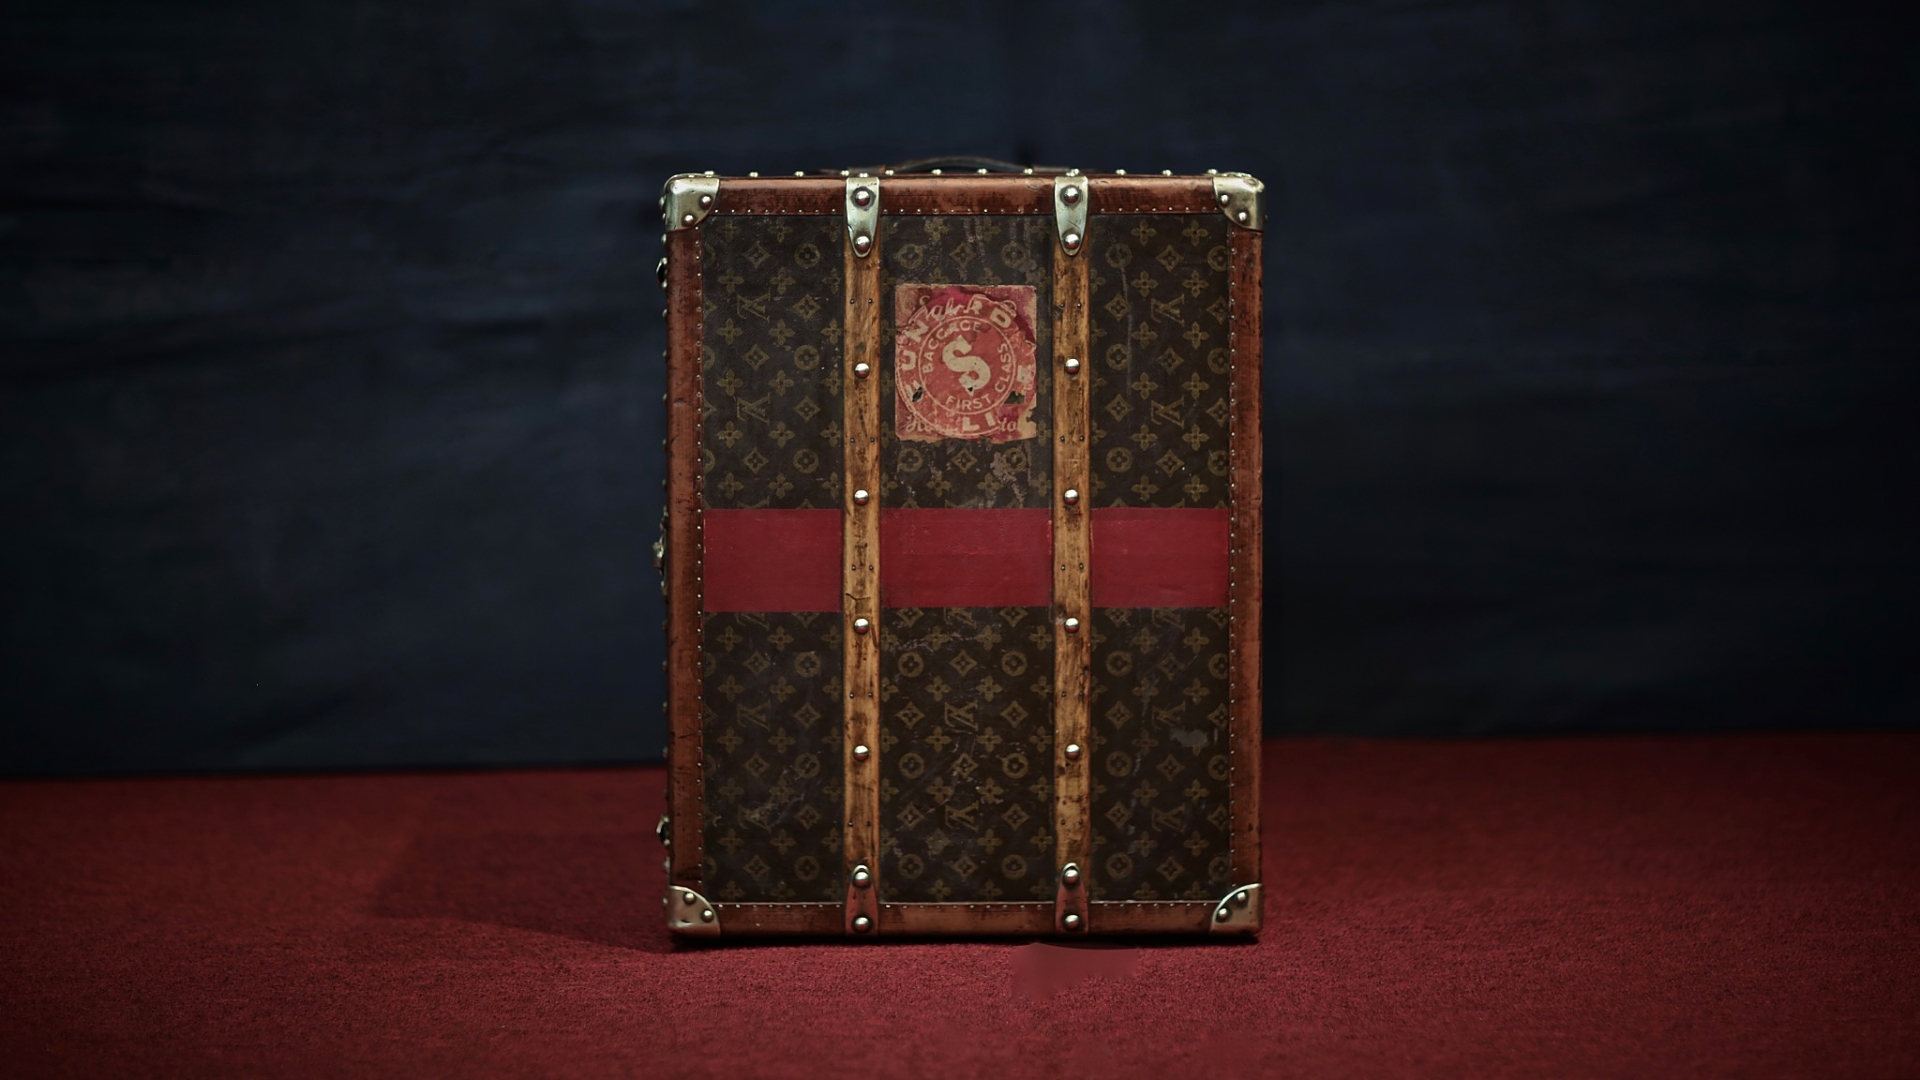 ... the-trunk-louis-vuitton-thumbnail-product-5603-2 ... 4b67bbafee7